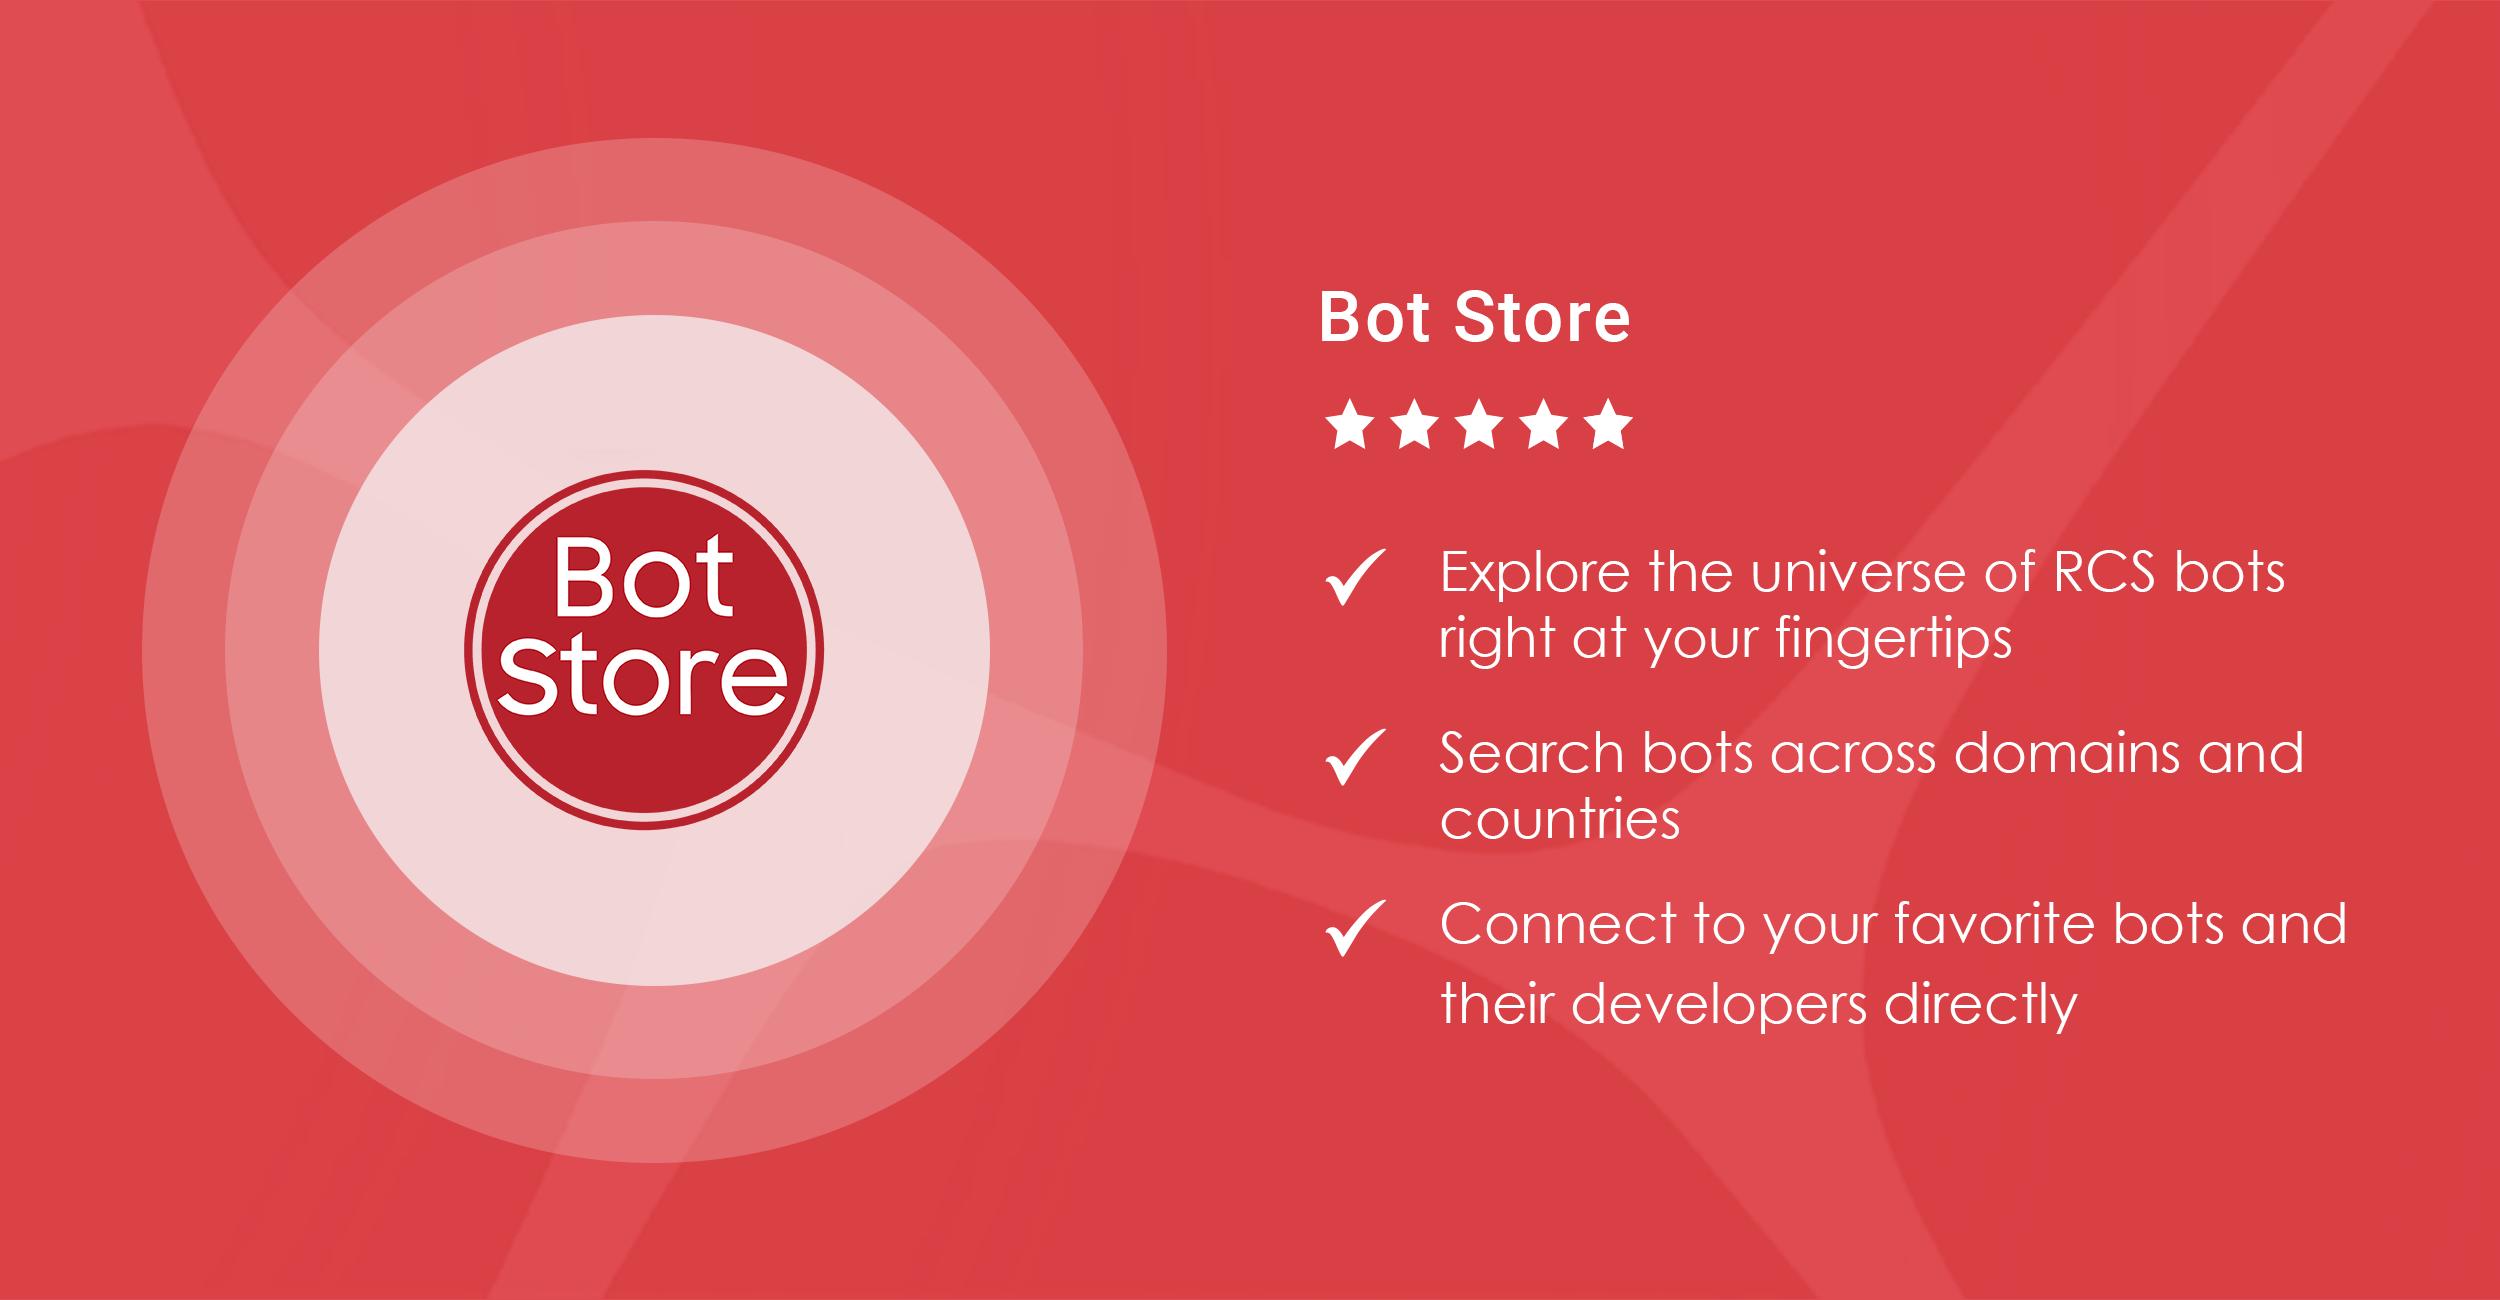 Bot Store